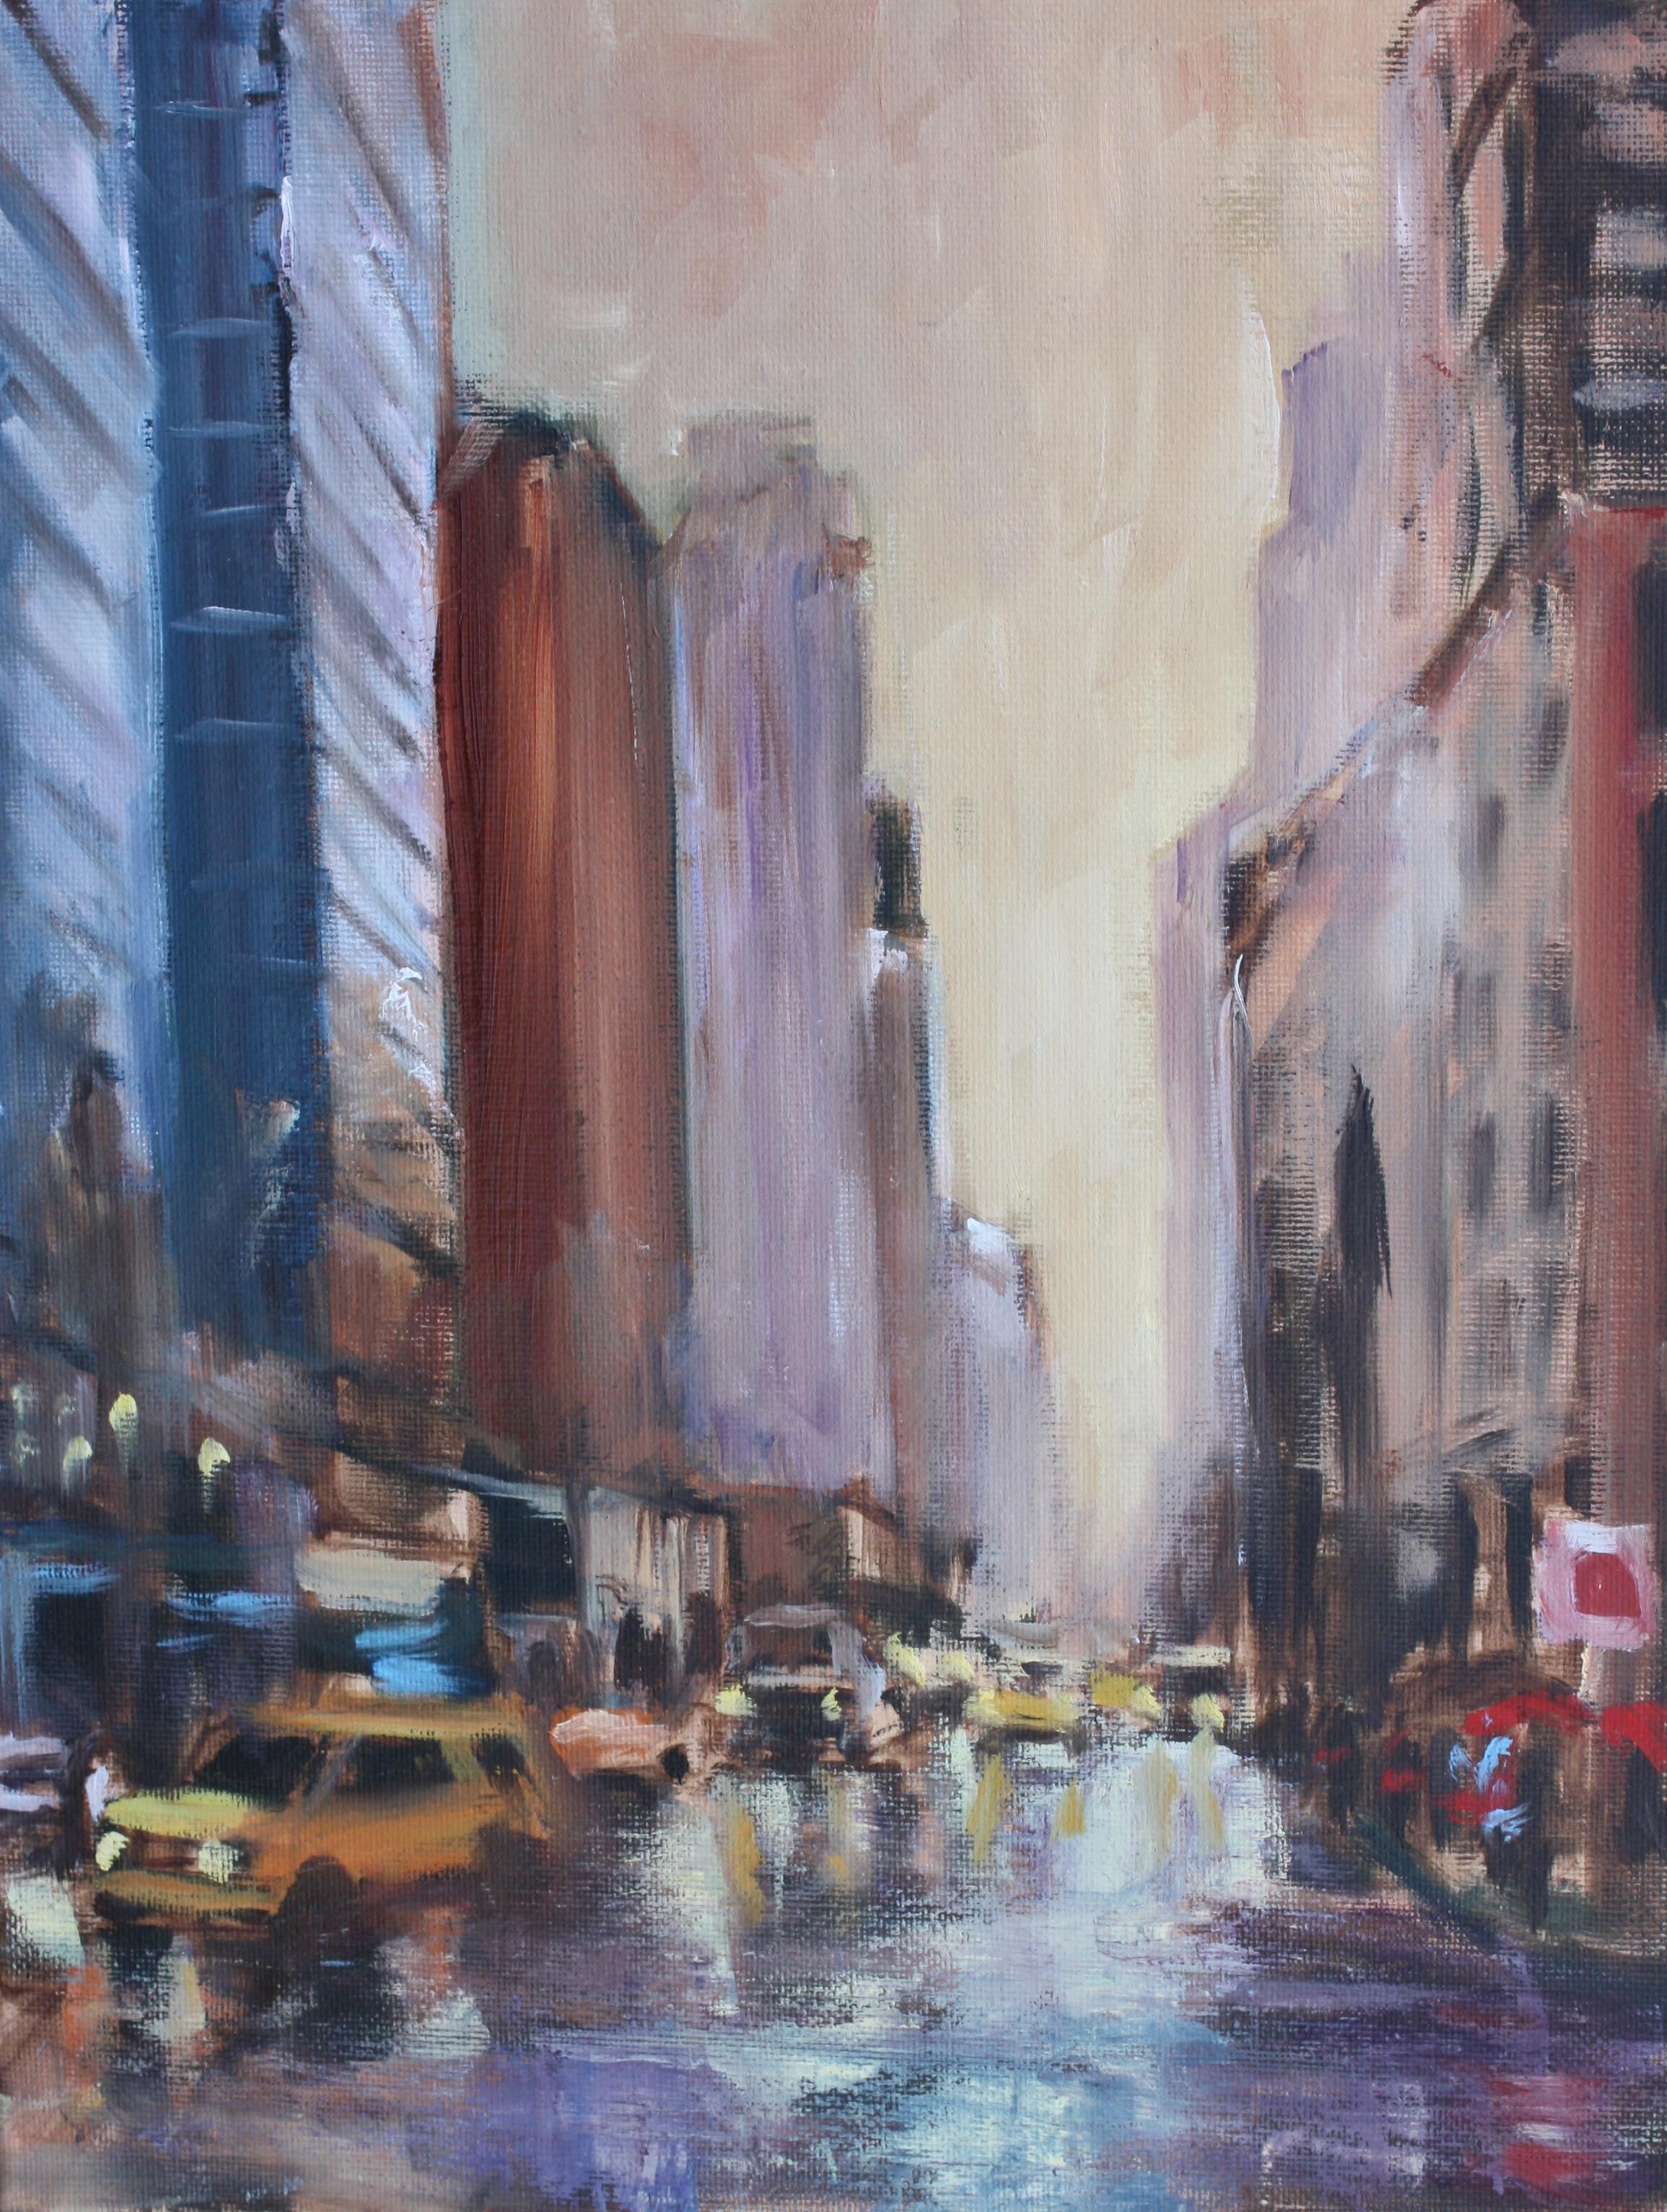 NYC by Wulff-Arts